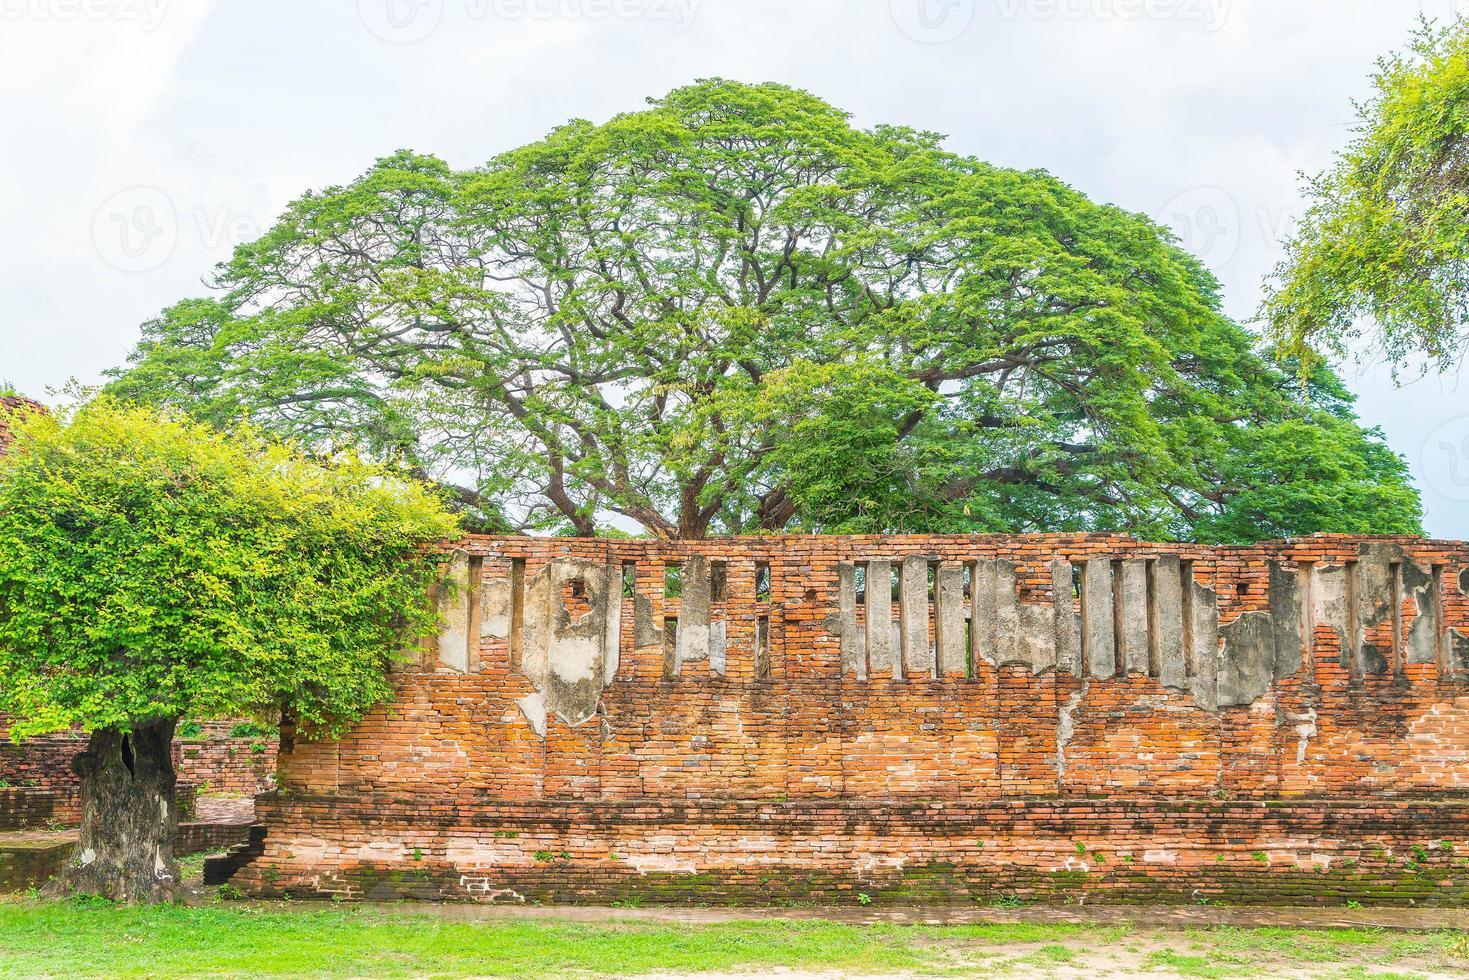 bela arquitetura antiga histórica de Ayutthaya na Tailândia - impulsione o estilo de processamento de cores foto